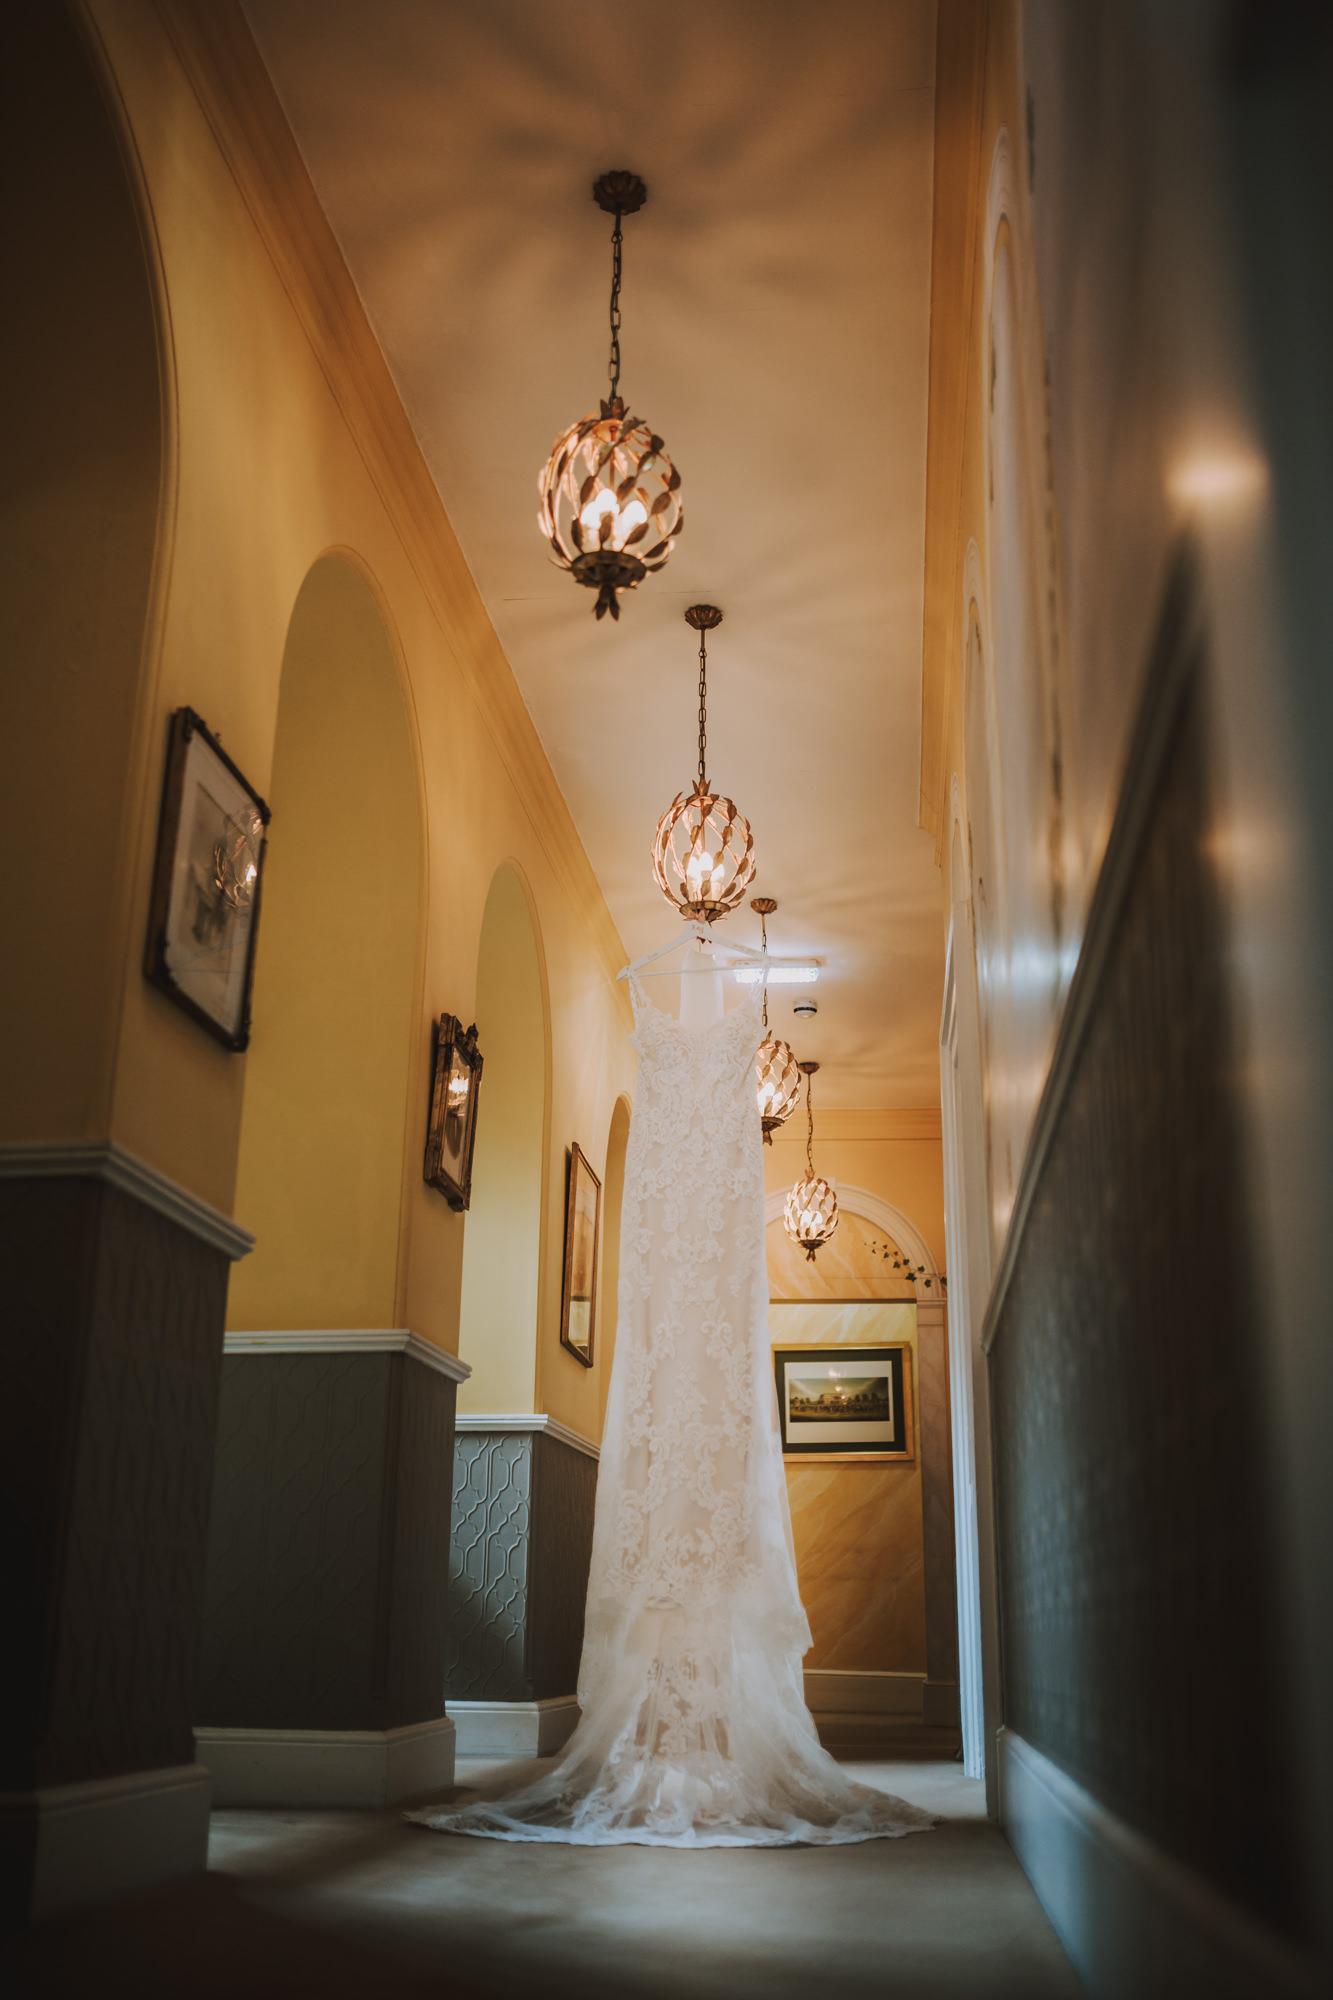 hodsock priory wedding photographers blog8.jpg